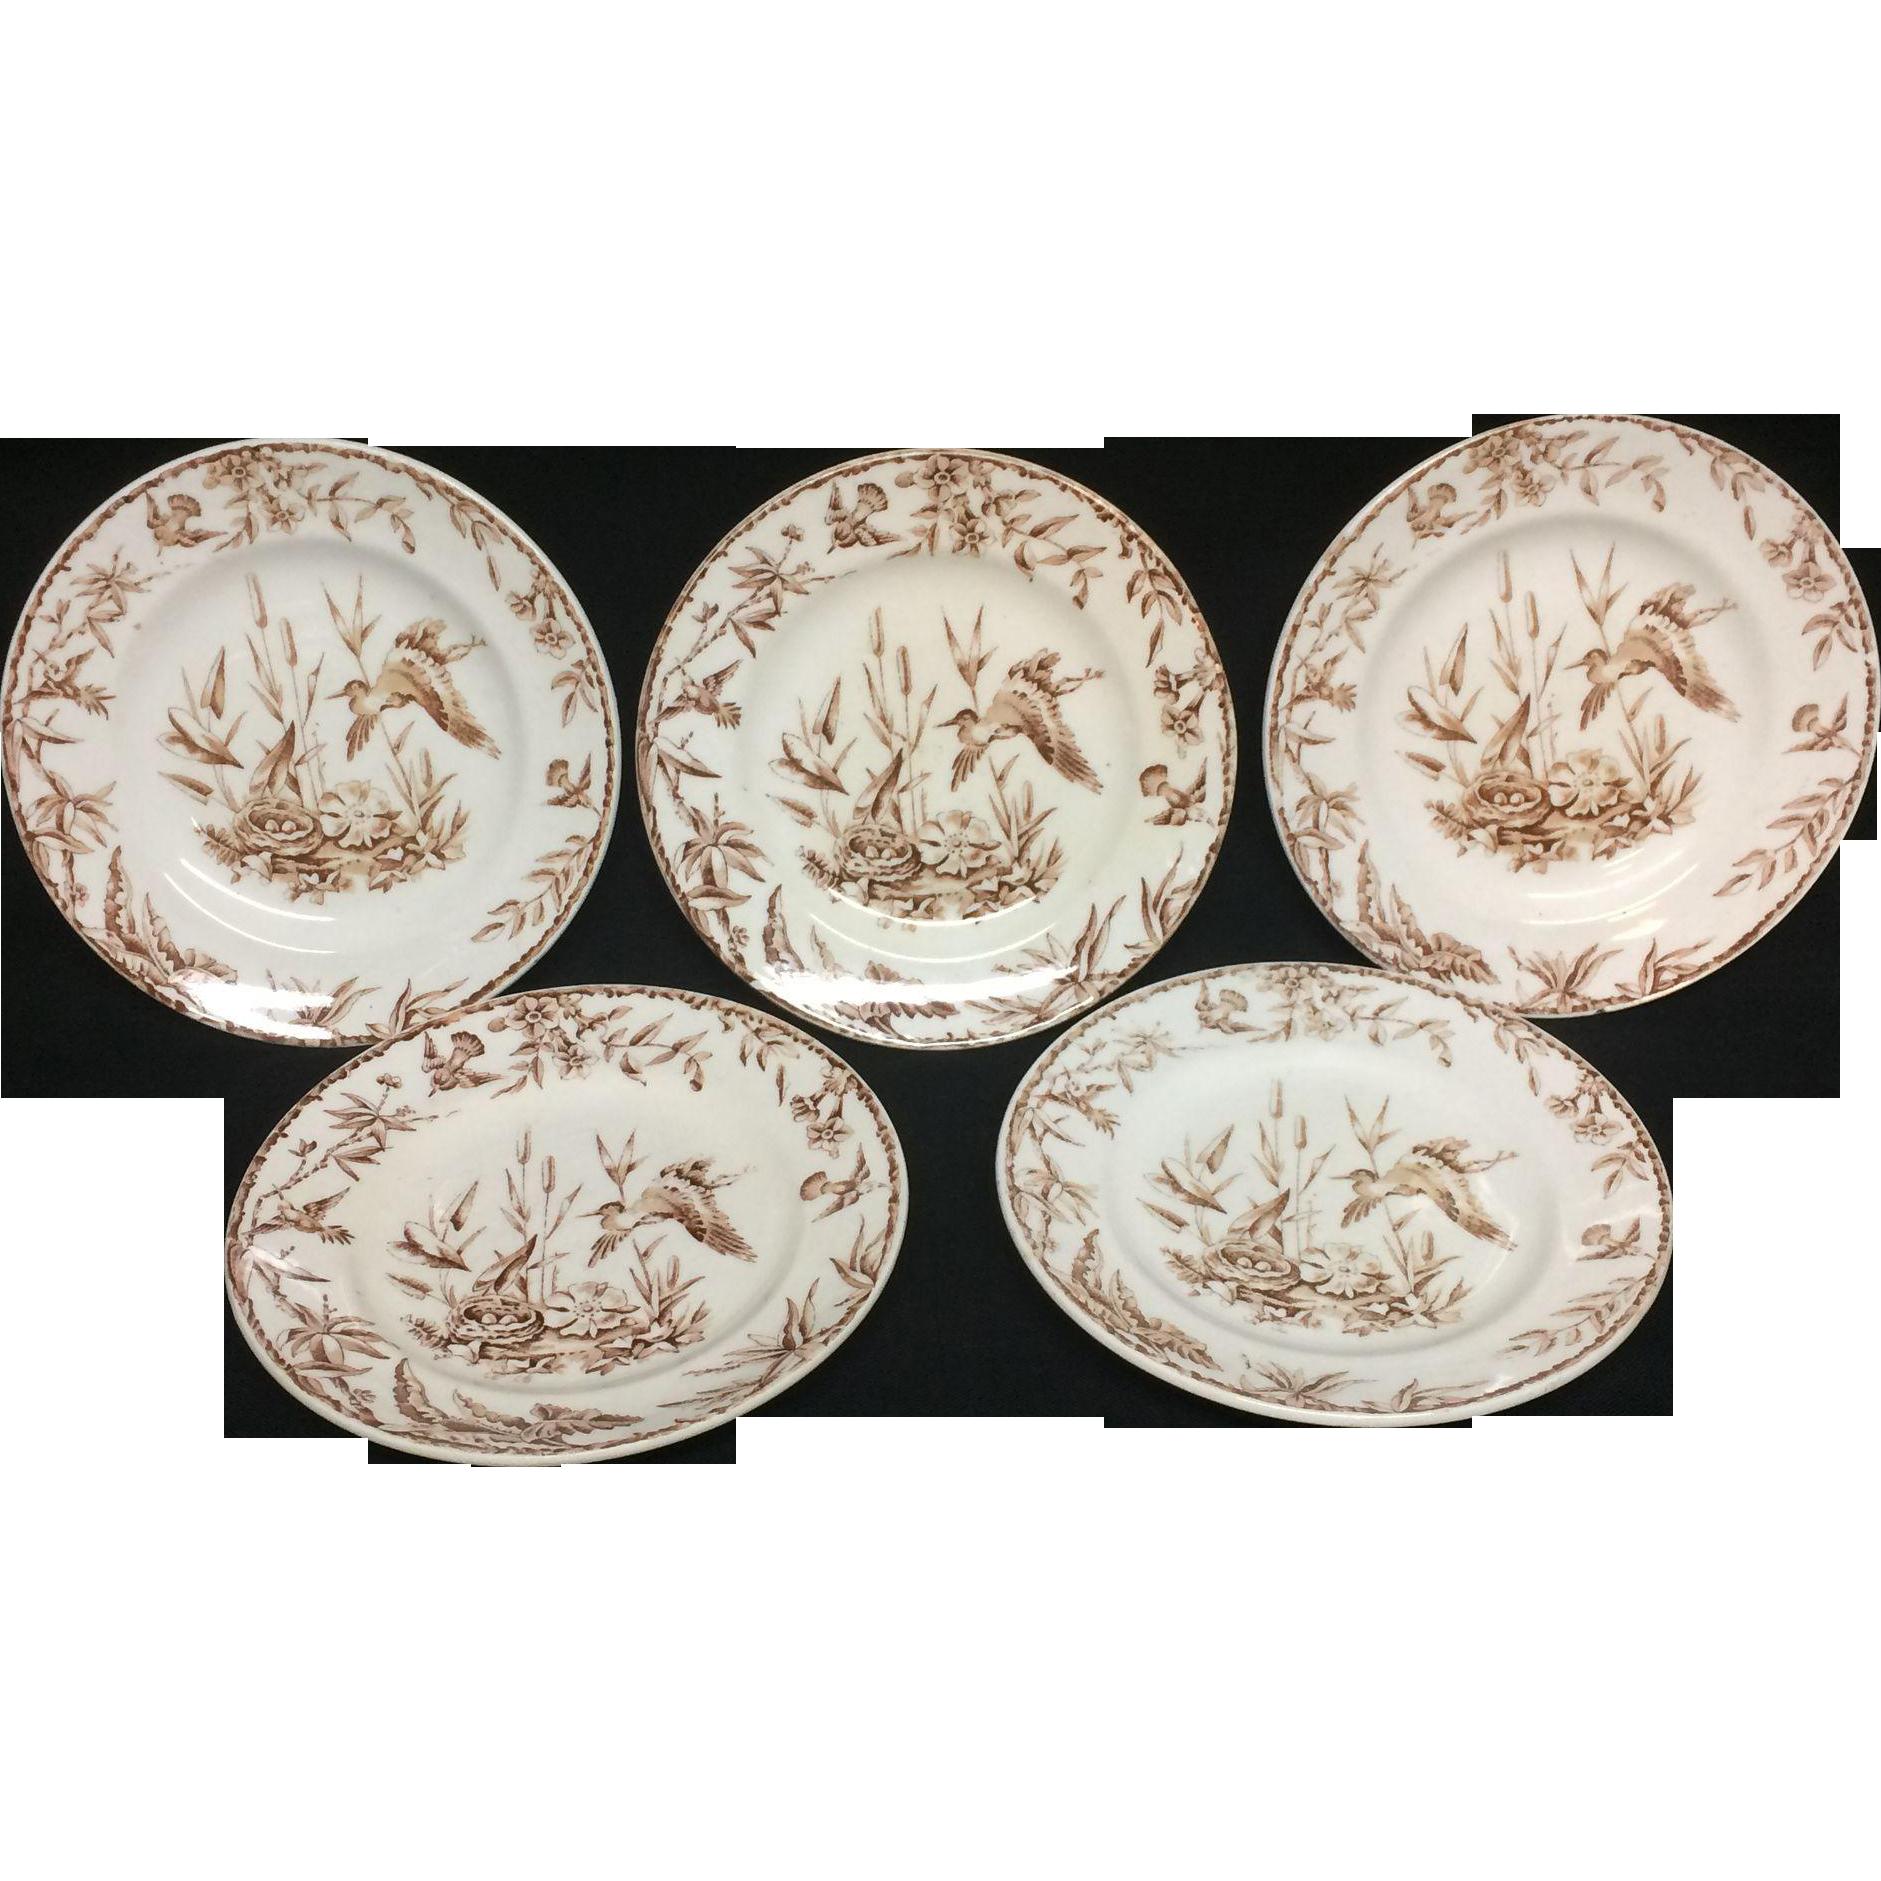 1885 ~ FIVE INDUS Exotic Birds Brown Transferware Plates